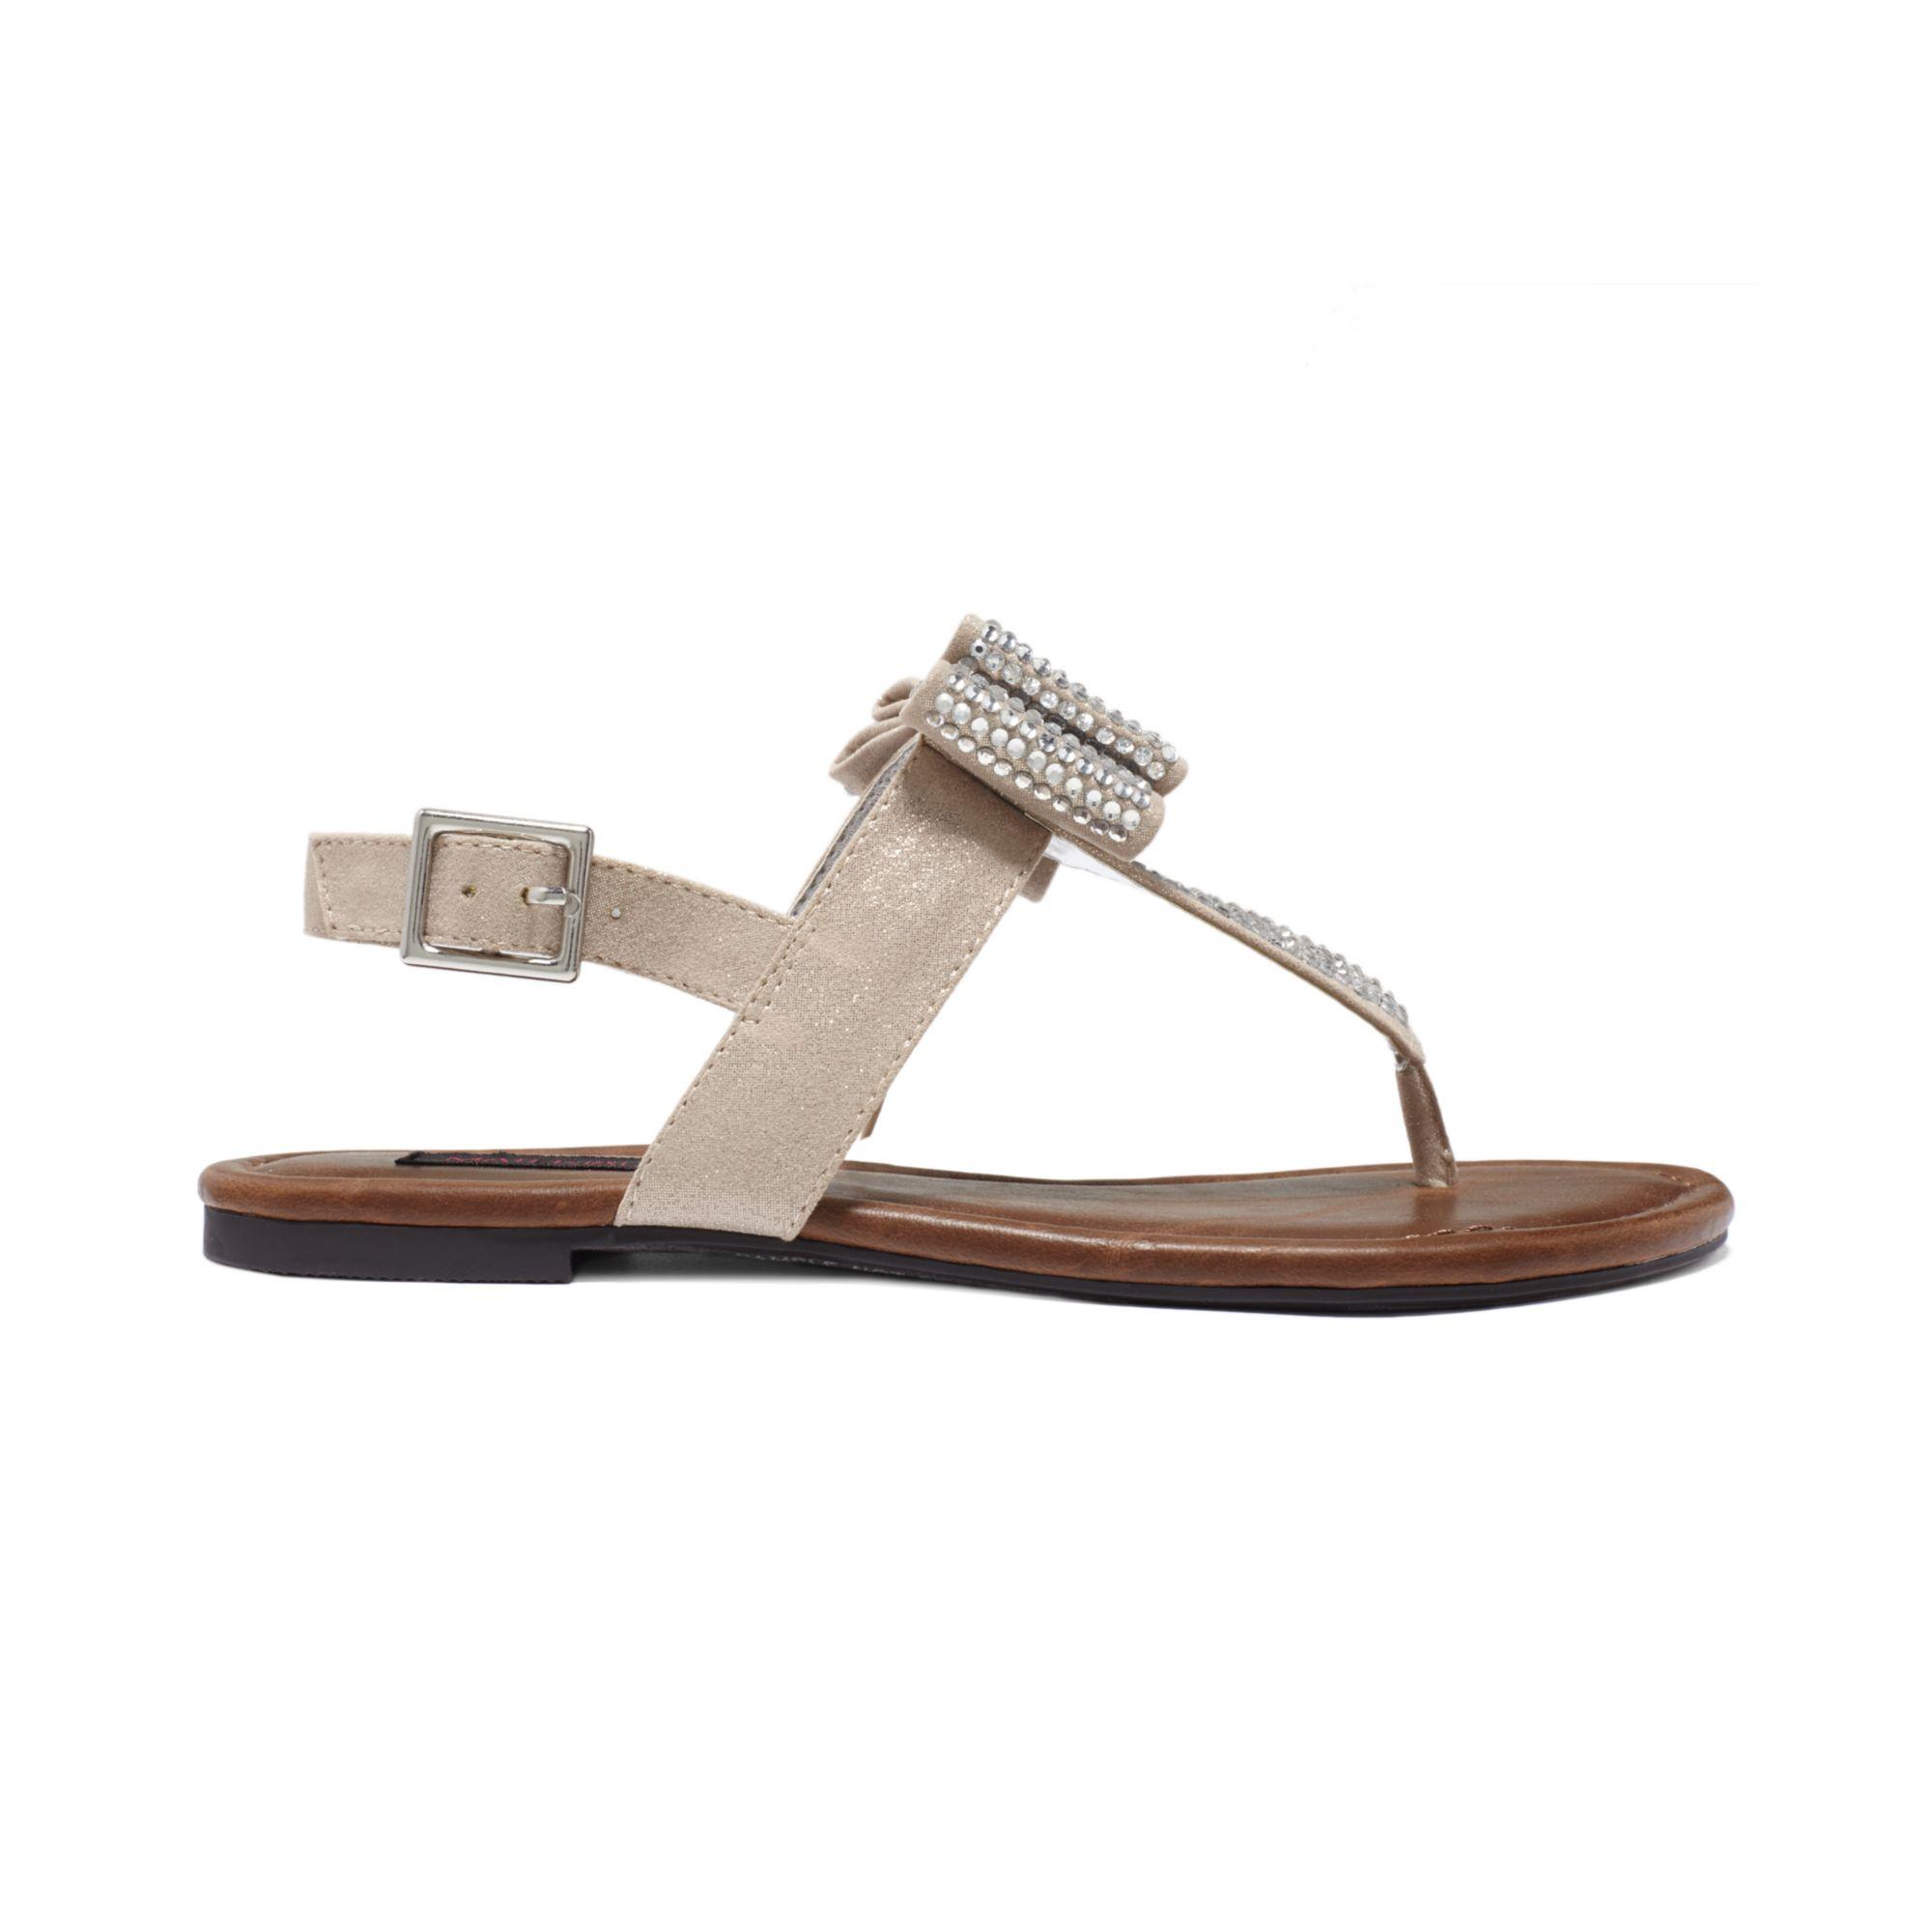 Lyst Material Girl Shayla Flat Sandals In Metallic